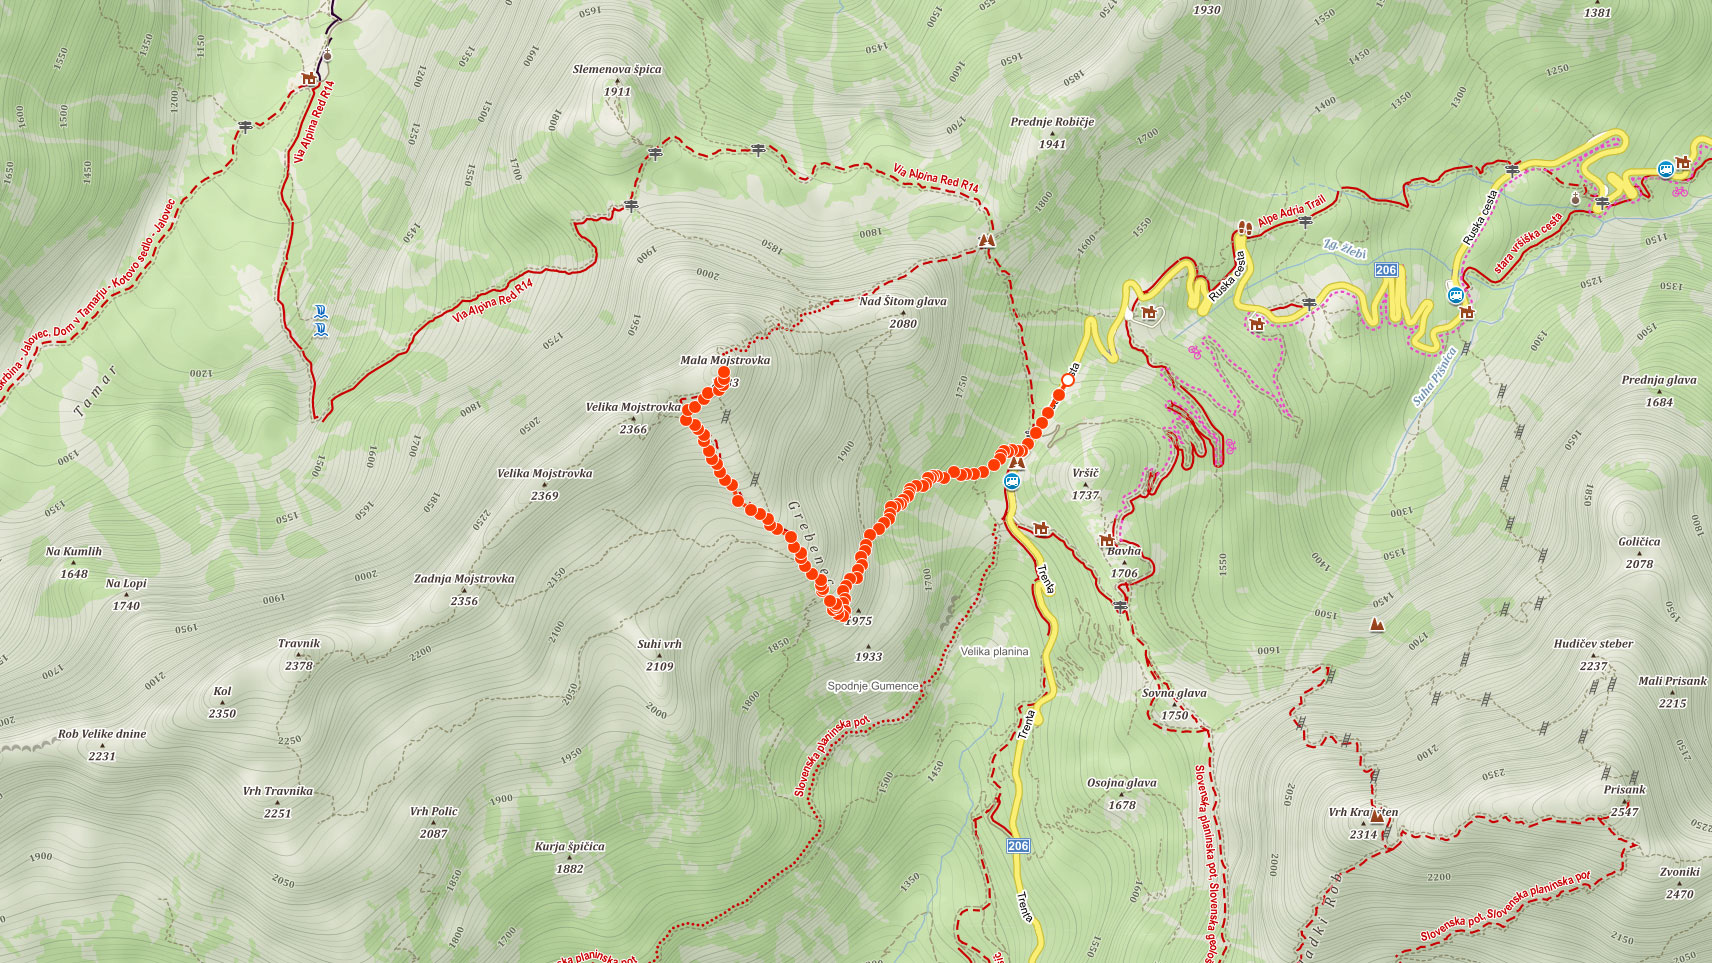 Mapa výletu na Malou Mojstrovku ve Slovinsku